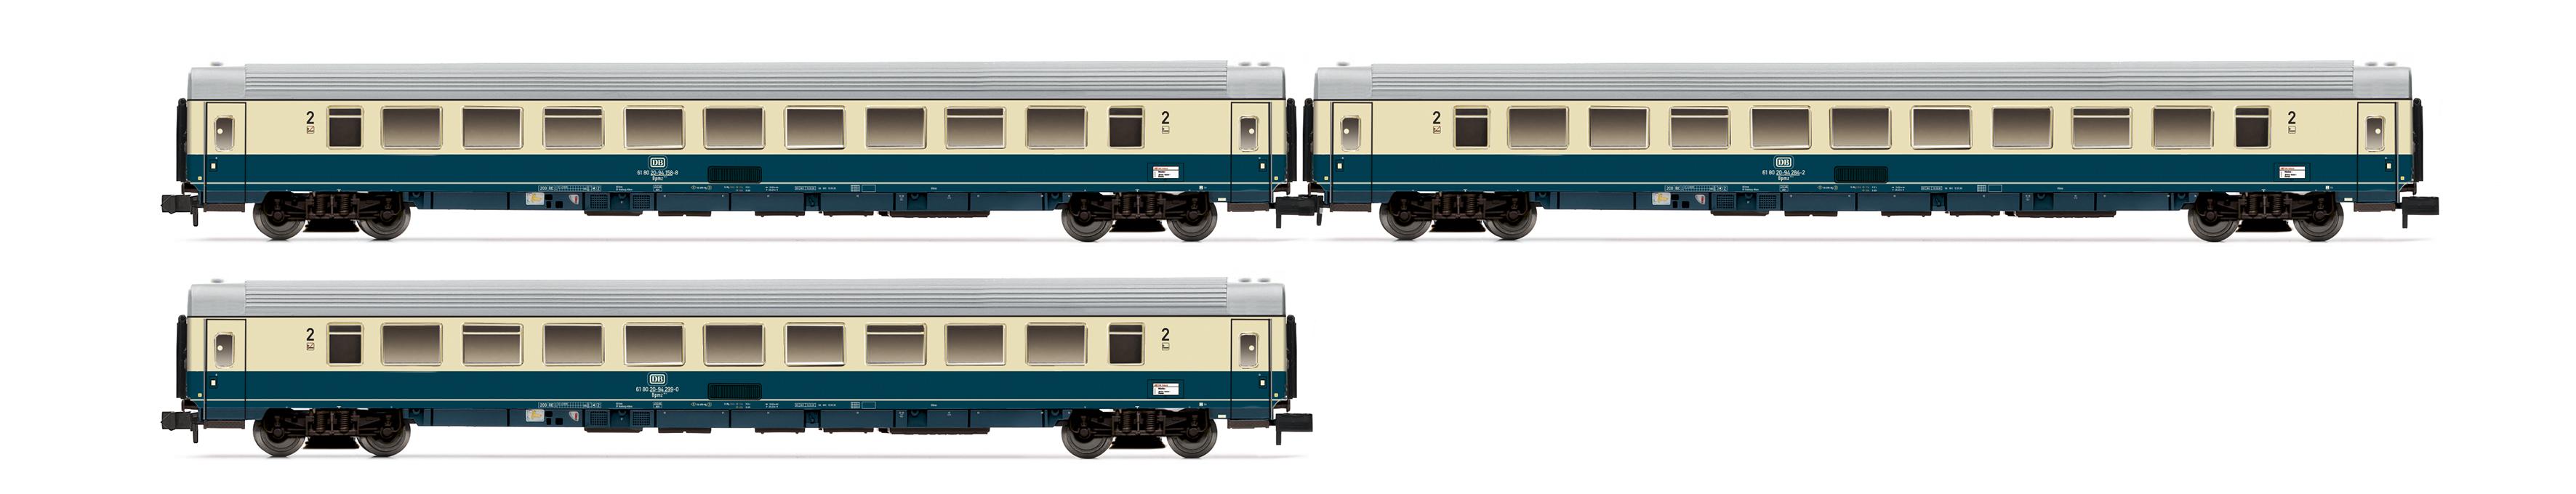 Arnold 3-tlg orie Set InterCity-Wagen 2.Klasse der DB